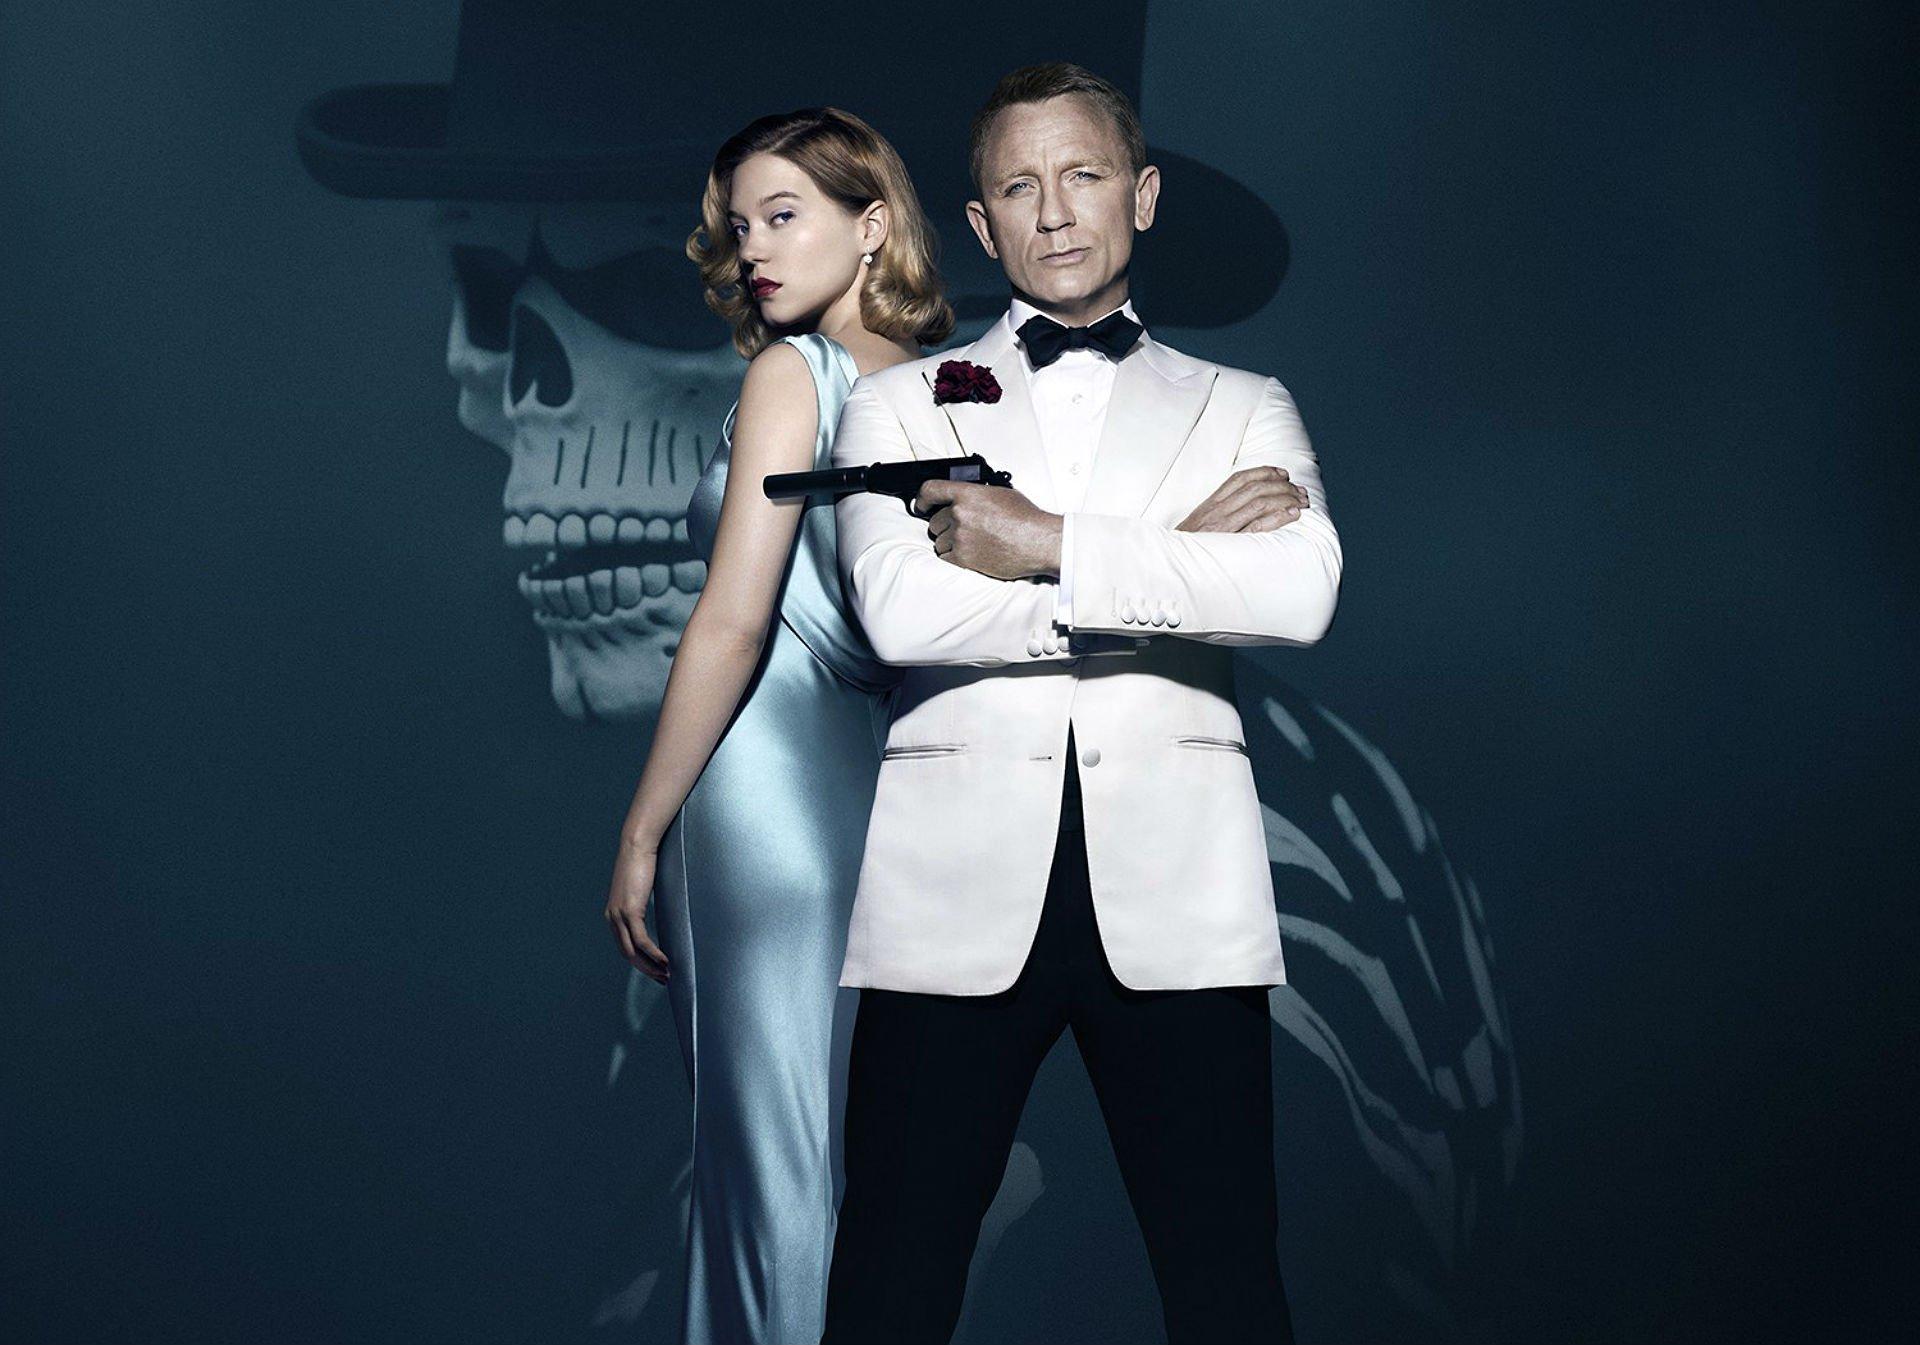 SPECTRE 007 BOND 24 james action 1spectre crime mystery spy thriller 1920x1345